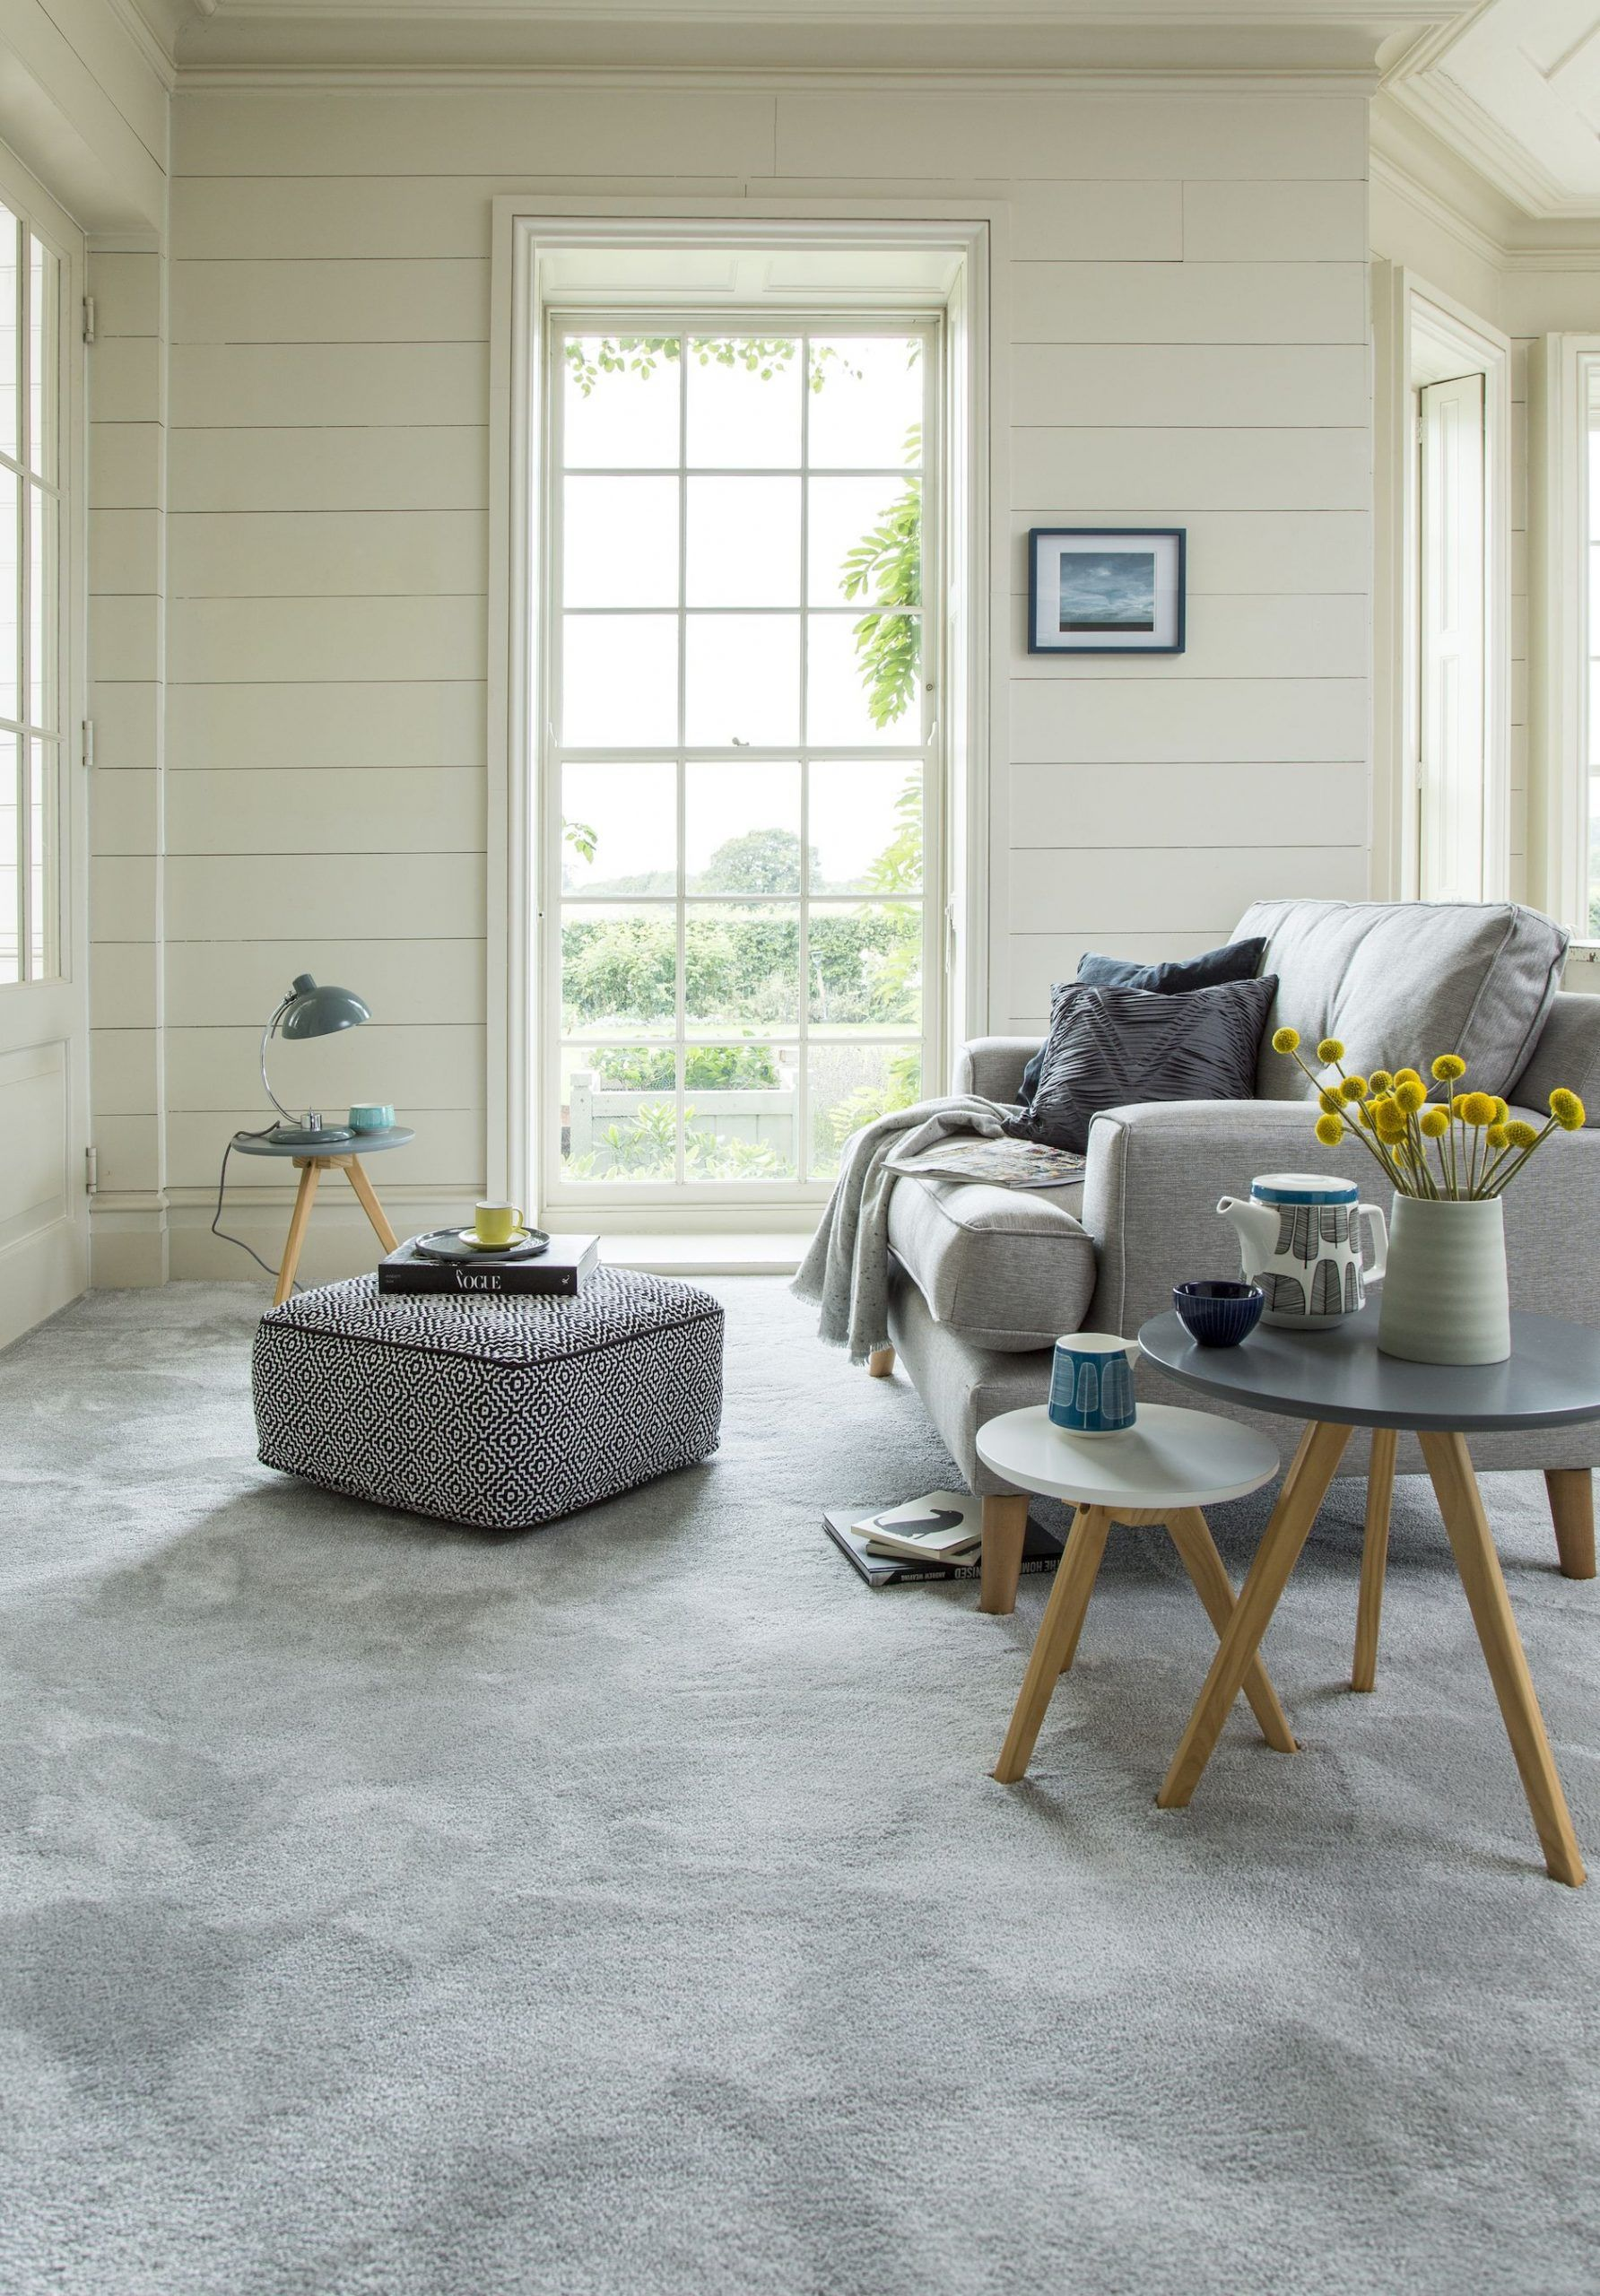 Grey Living Room Design Idea New 19 Grey Living Room Ideas Grey Living Room Grey Carpet Living Room Living Room Grey Grey Couch Living Room